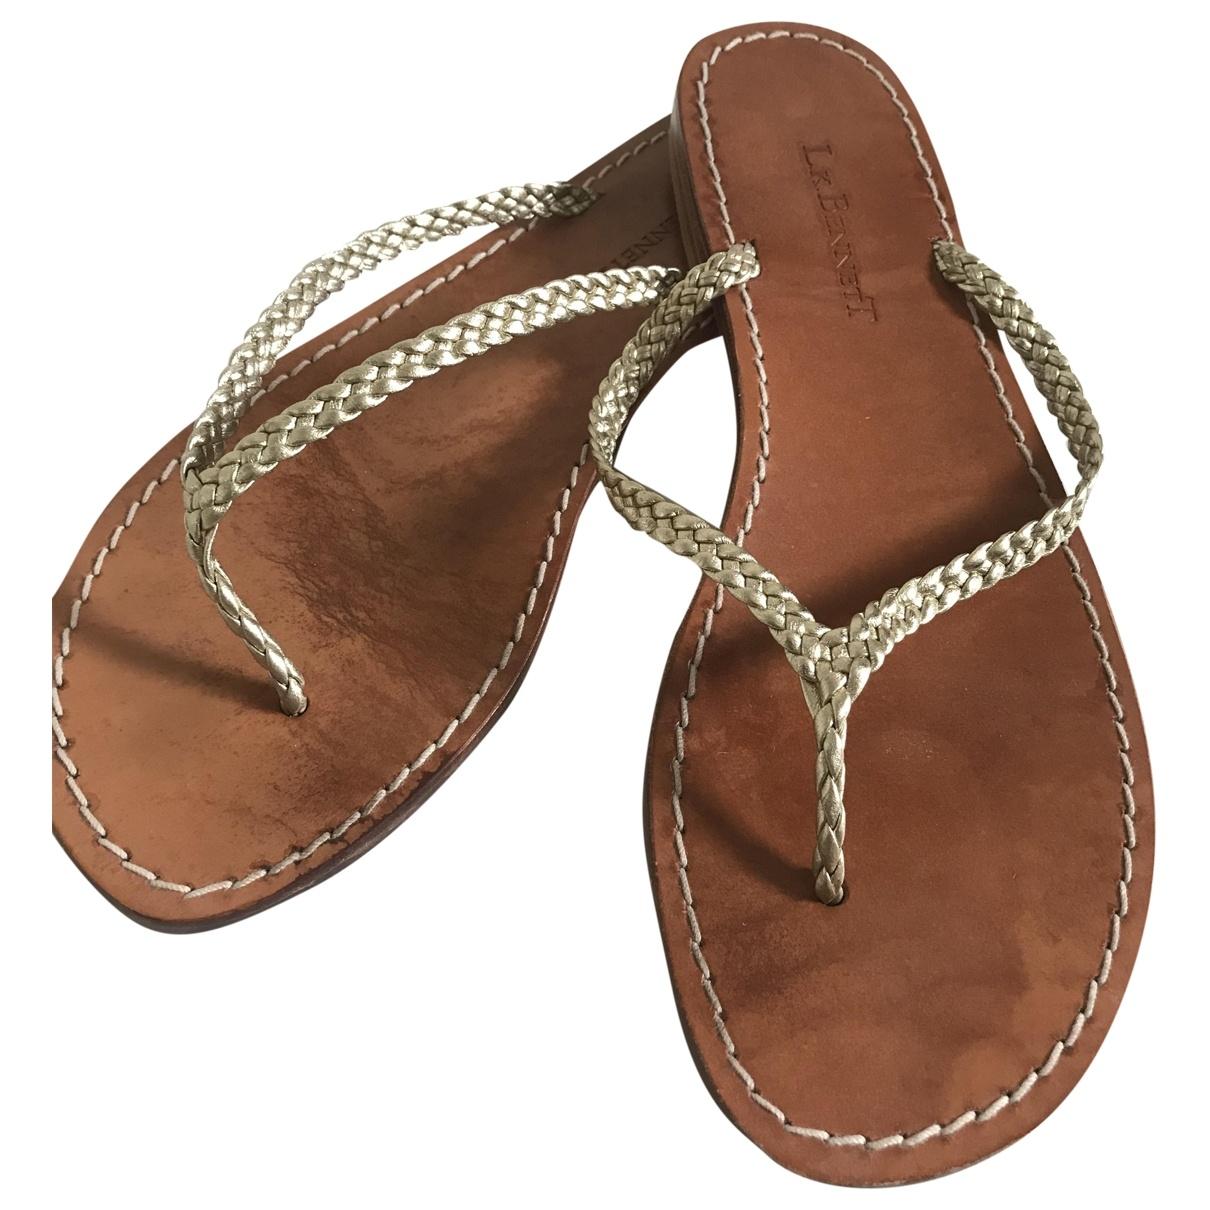 Lk Bennett - Sandales   pour femme en cuir - dore